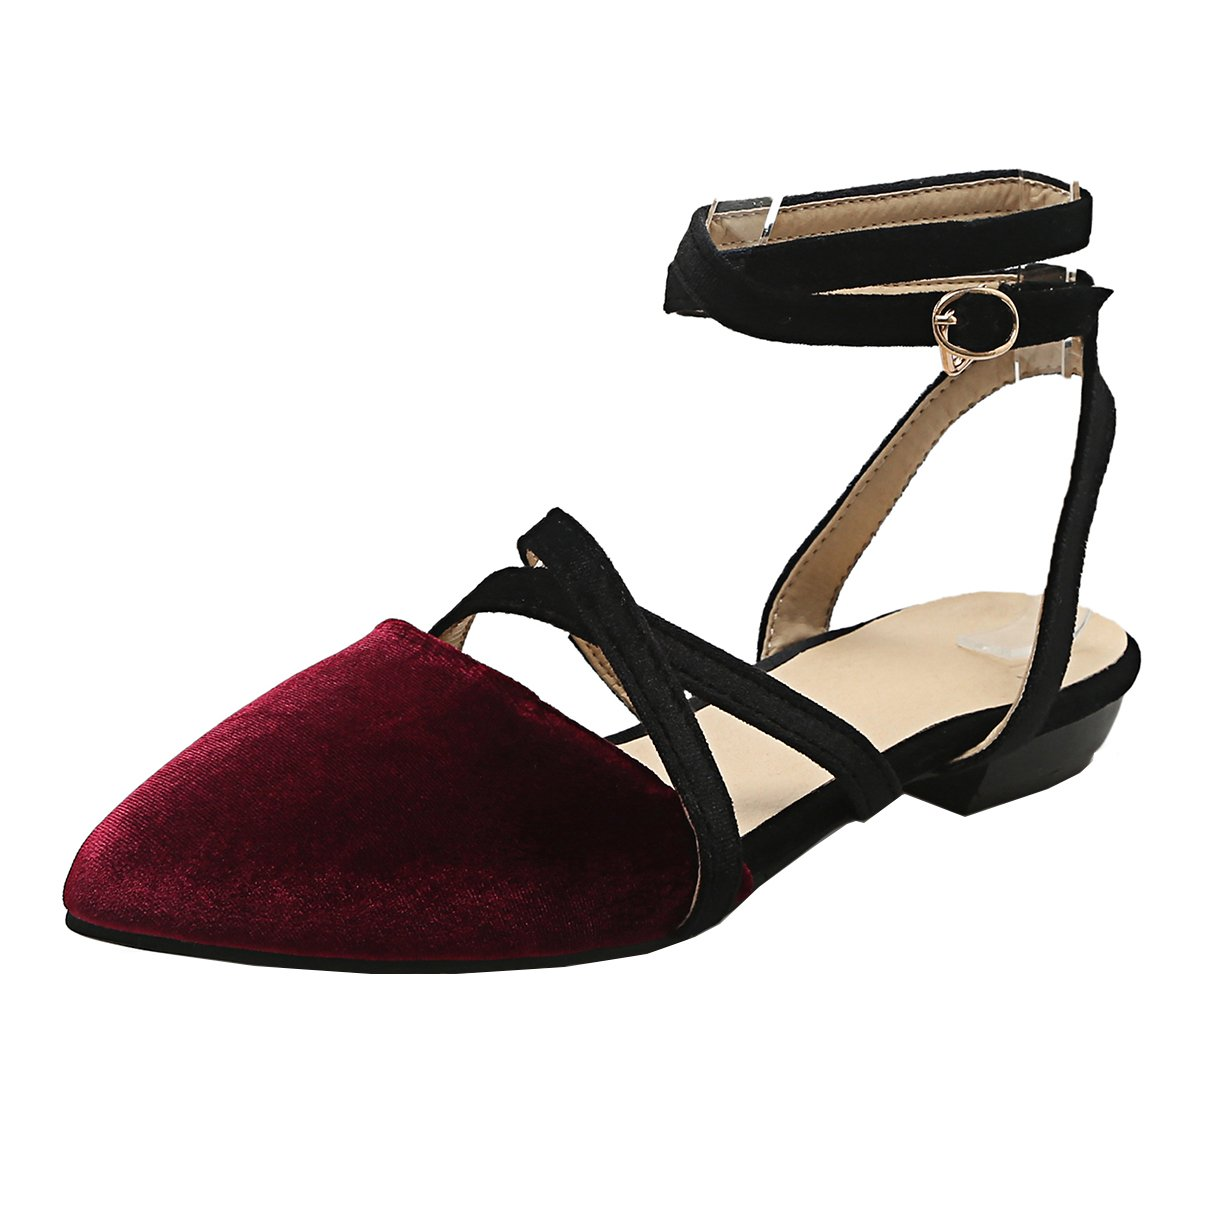 JYshoes , B00MY4MVGQ Coupe , JYshoes Fermées Femme Rouge d2f92bb - reprogrammed.space